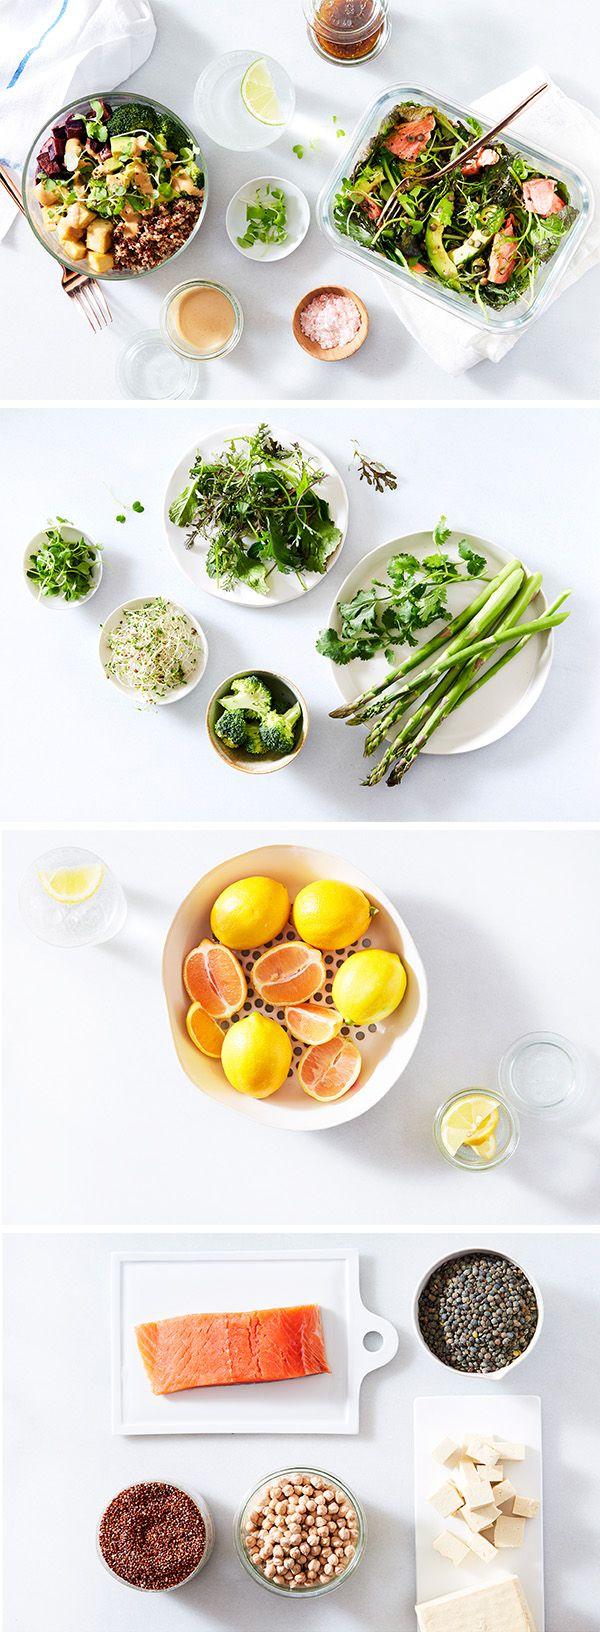 5 essentials for a perfect work lunch Вегетарианские